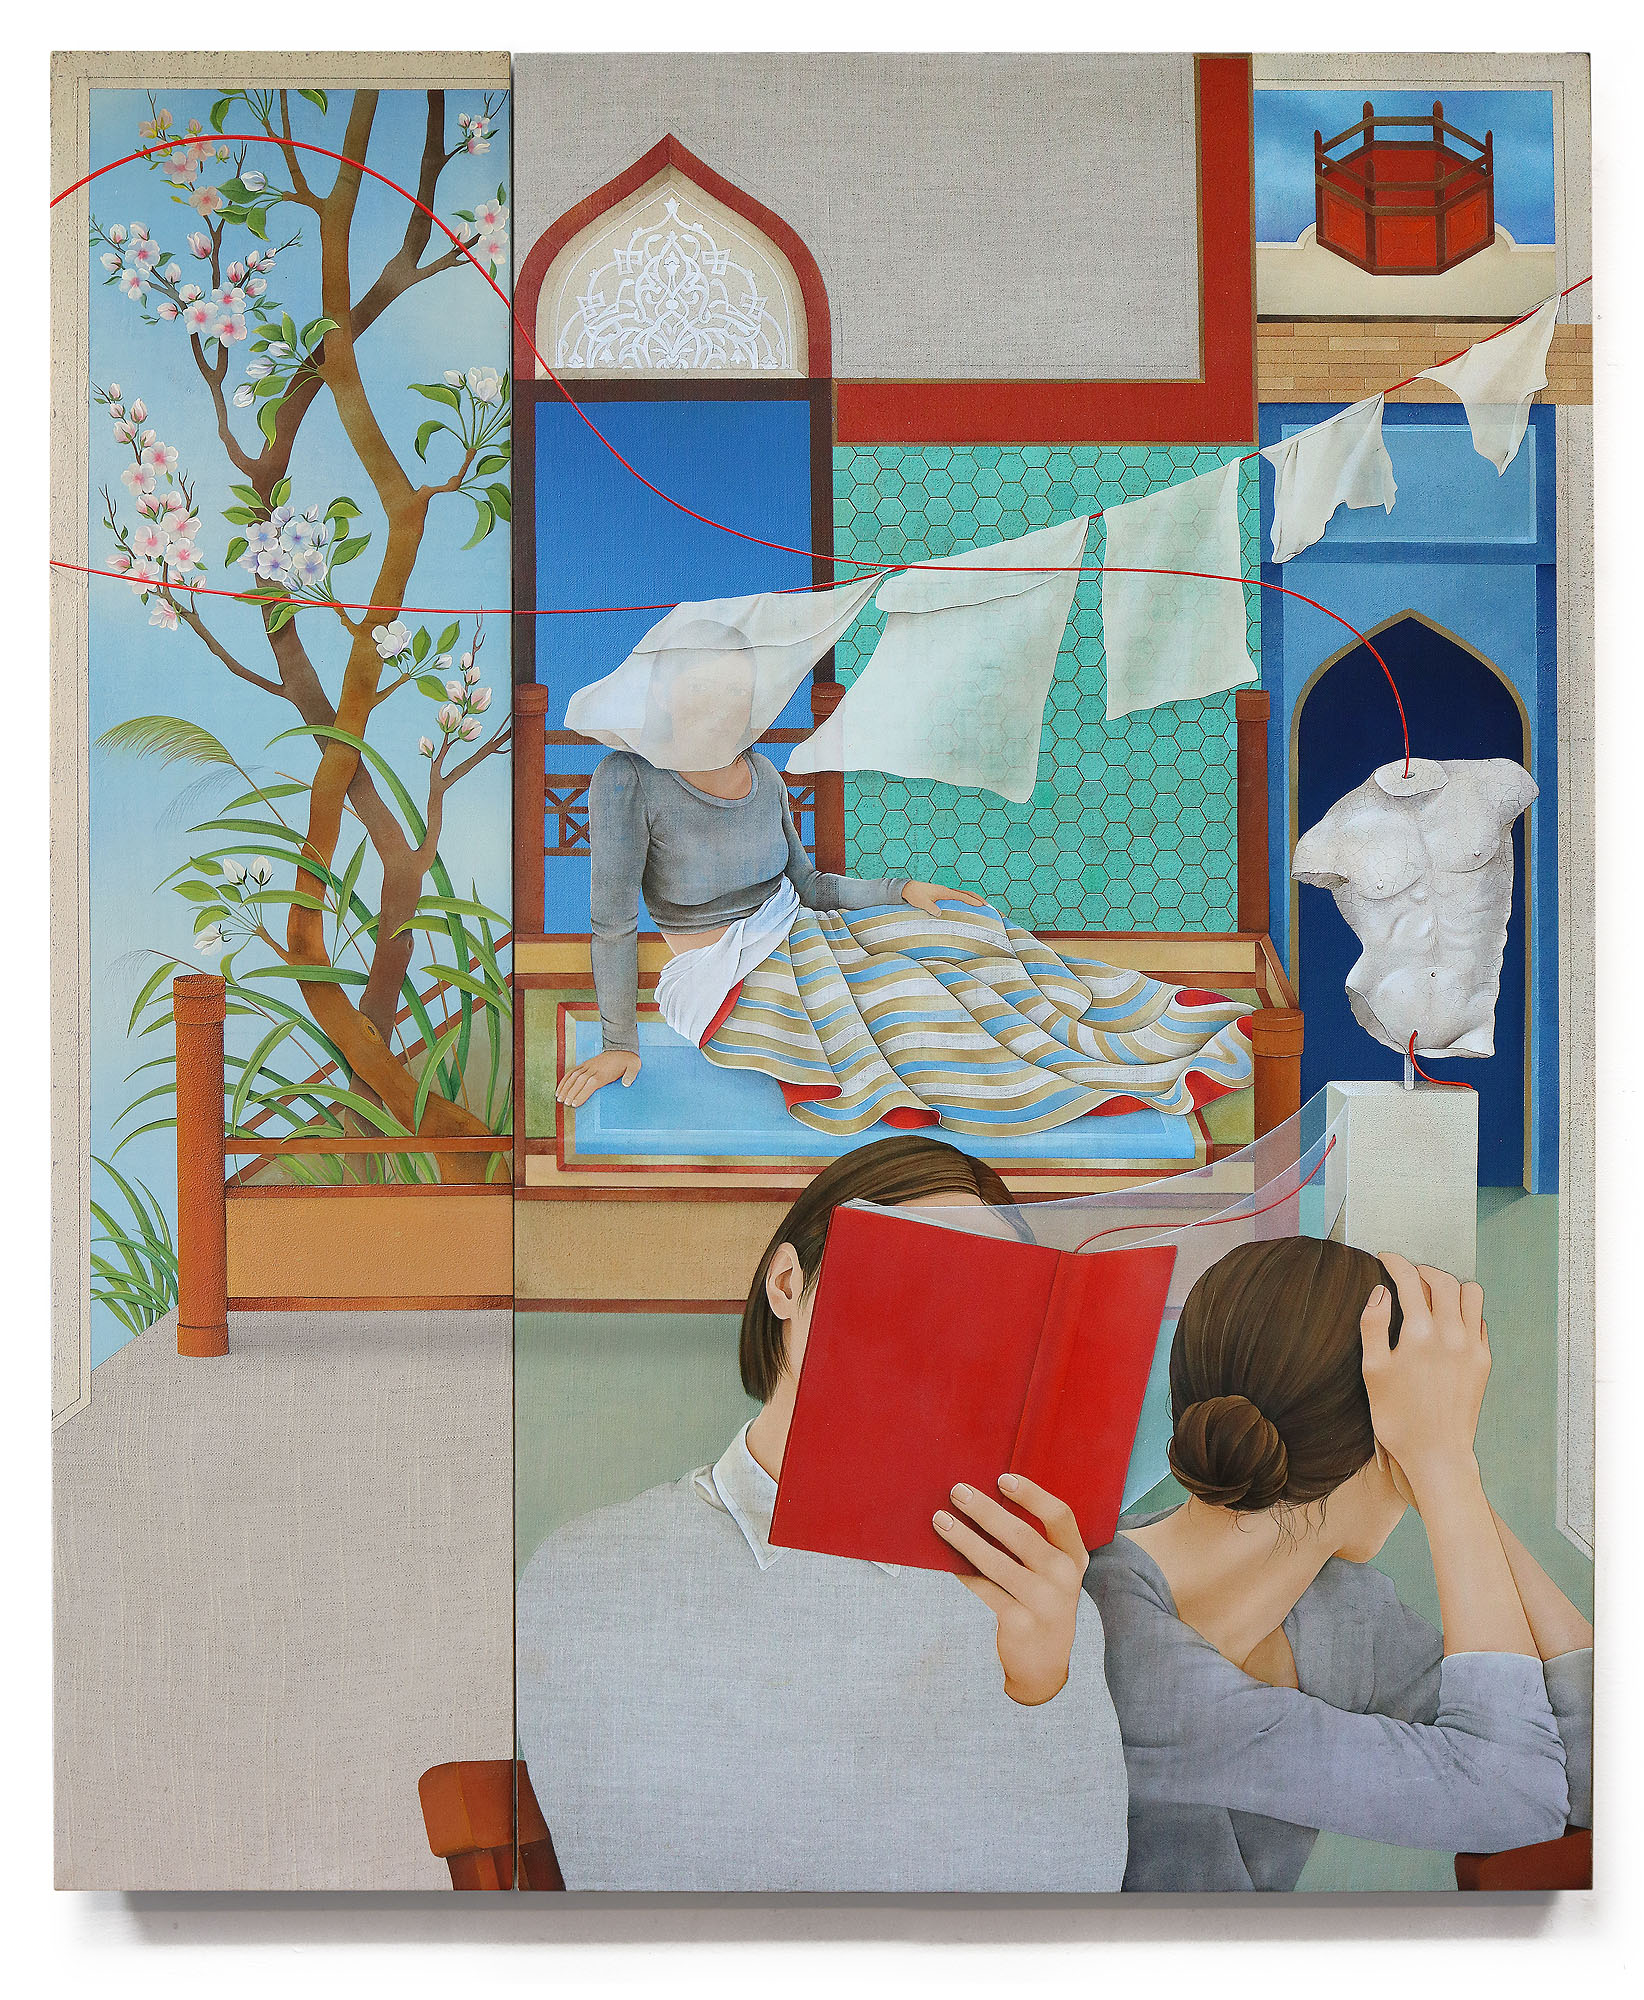 Arghavan Khosravi    Heaven Is A Place , 2018  Acrylic on linen canvas on wood panels  Two panels: 41.5× 34.5 inches